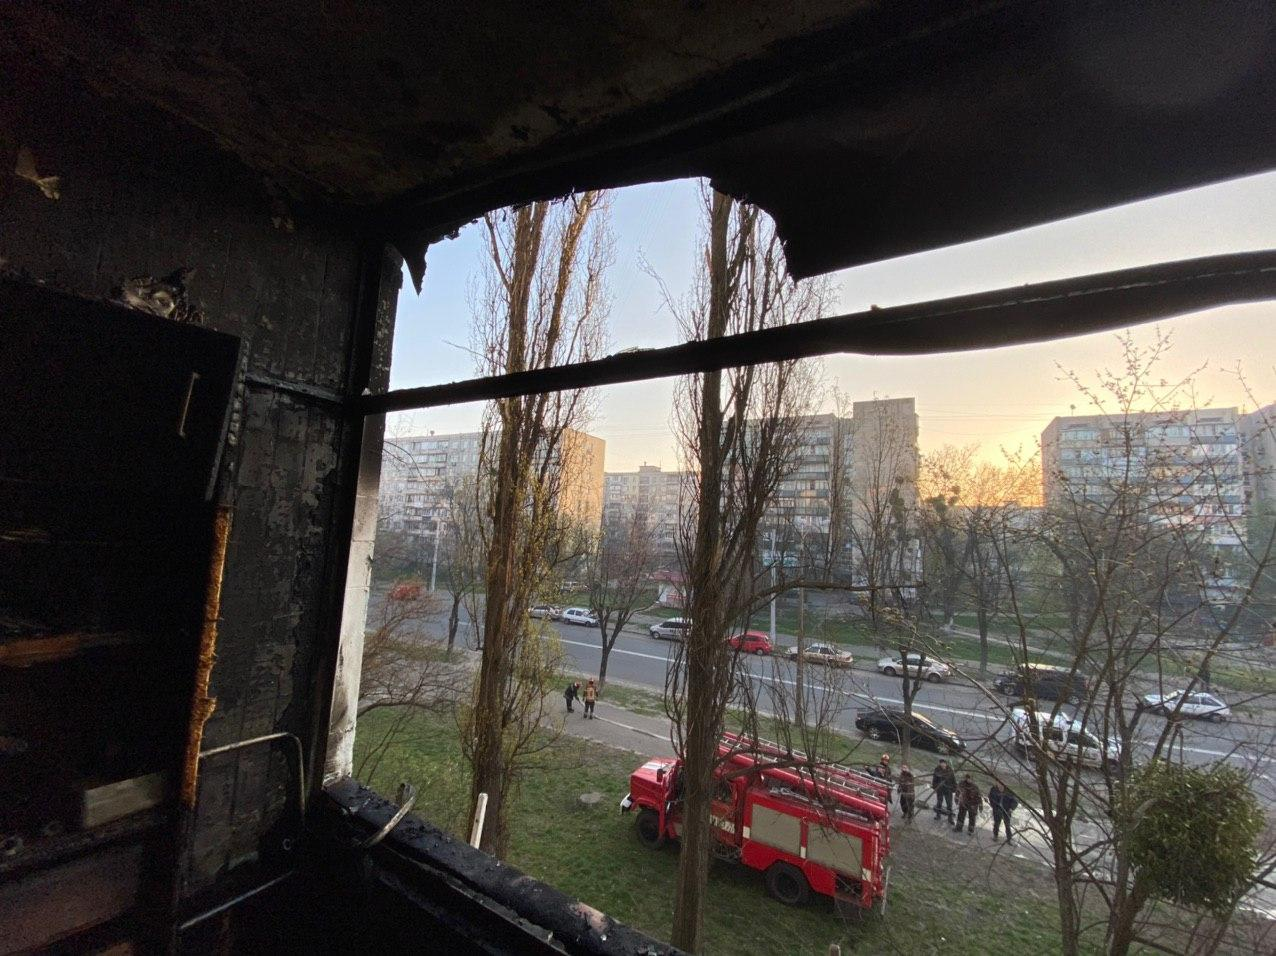 Пожежа в багатоповерхівці Києва: врятовано жінку -  - 66224c9bf627b9361e8f035b2d8e2318